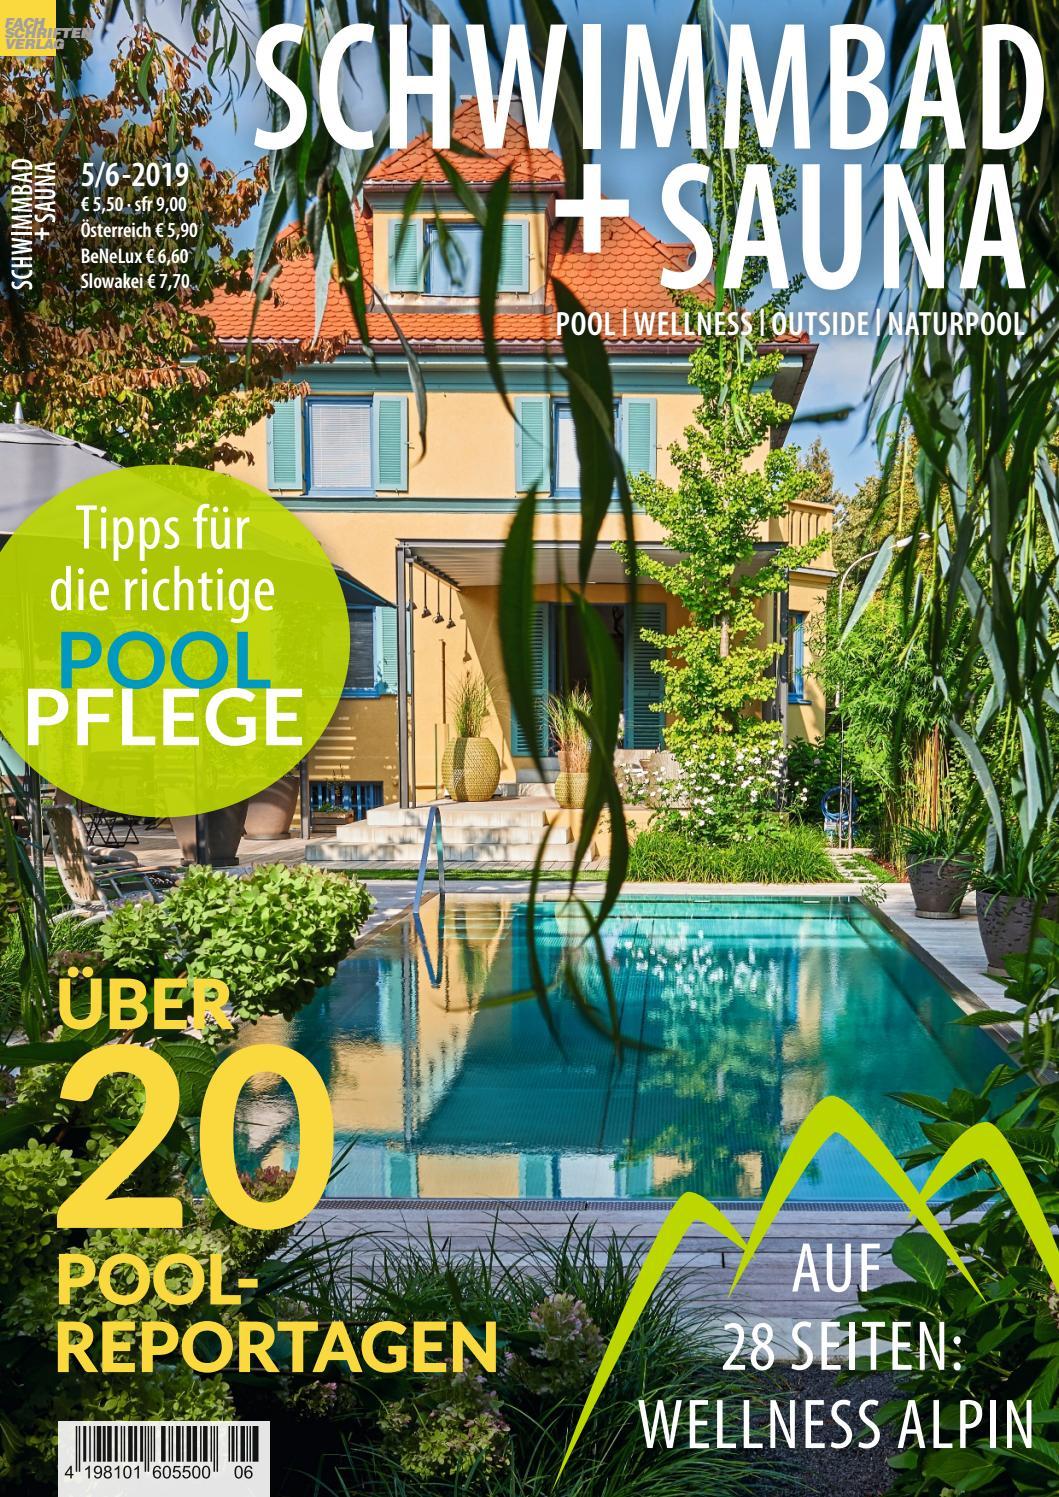 Gartenshop Fiedler Genial Schwimmbad Sauna 5 6 2019 by Fachschriften Verlag issuu